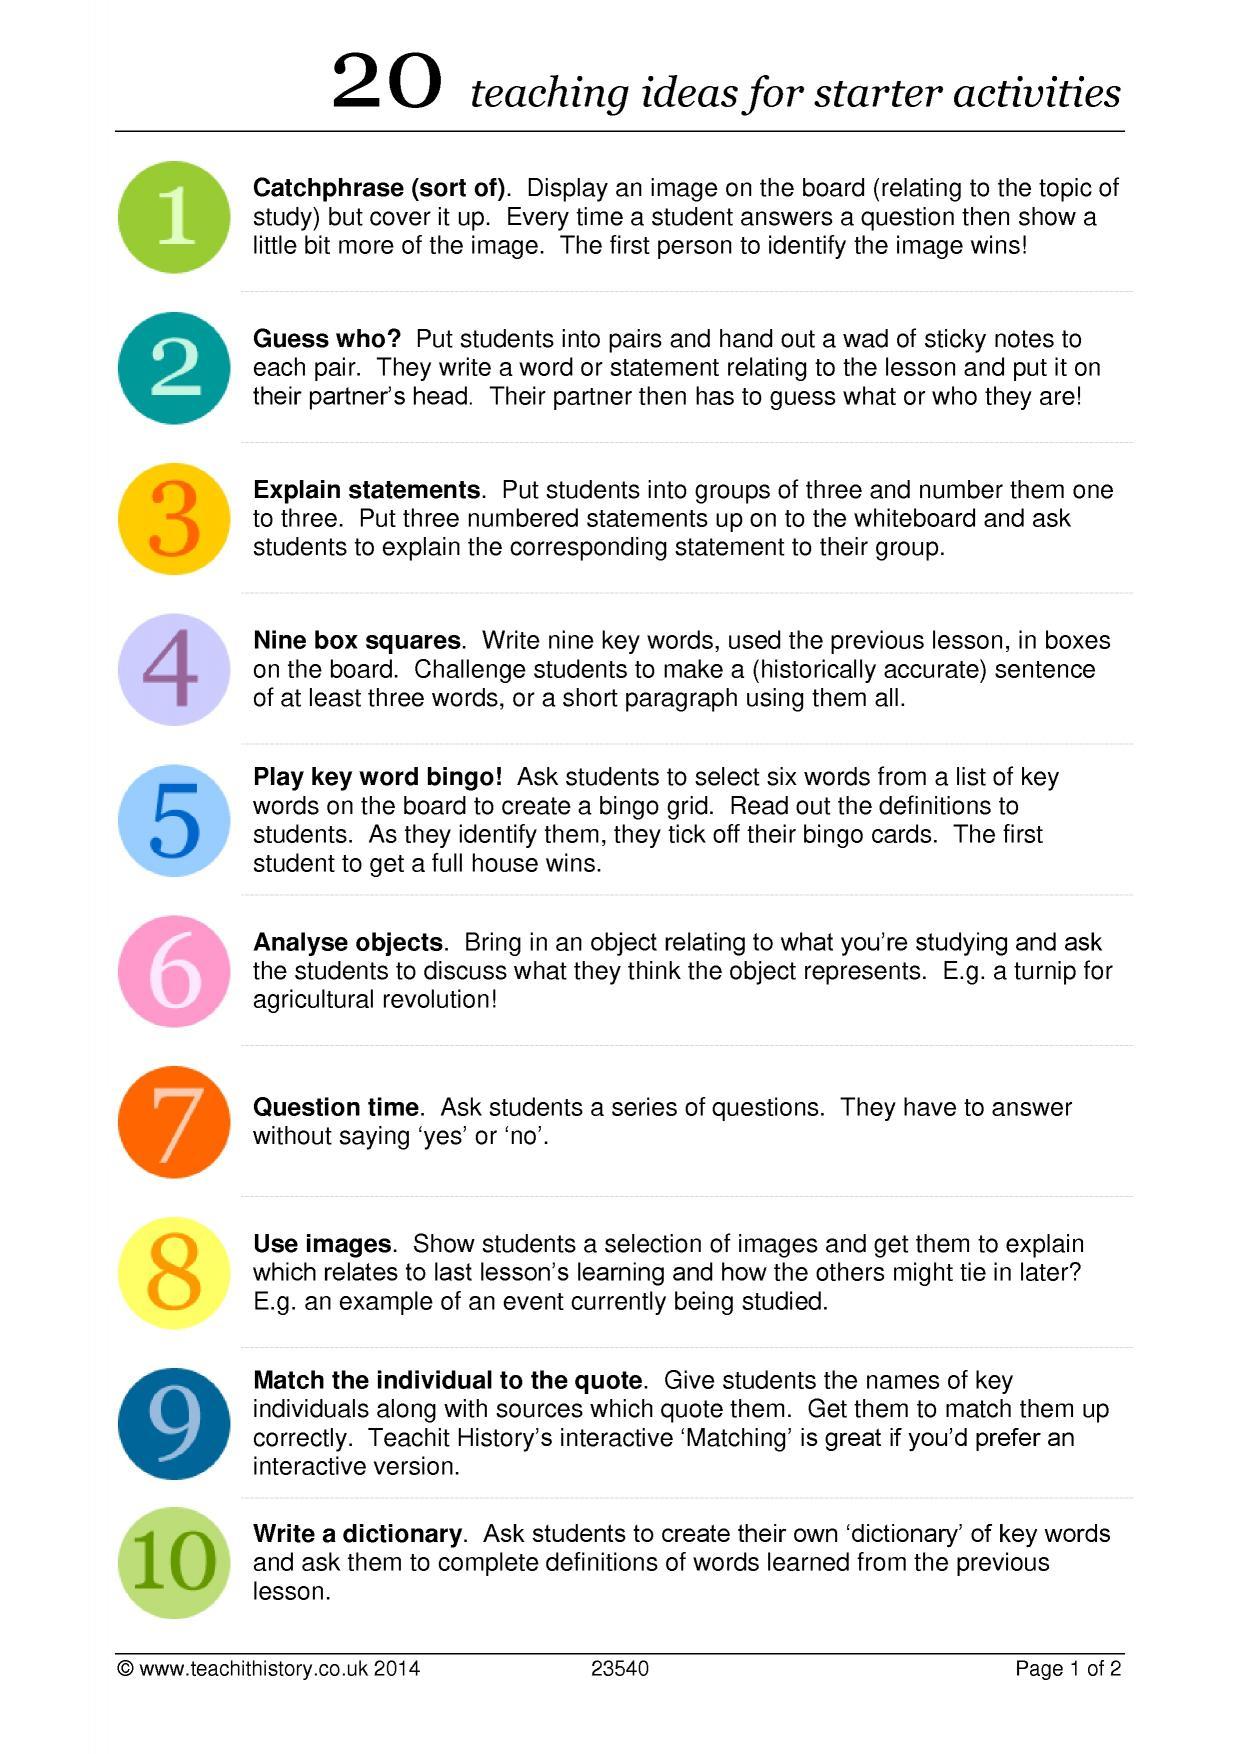 20 Teaching Ideas For Starter Activities